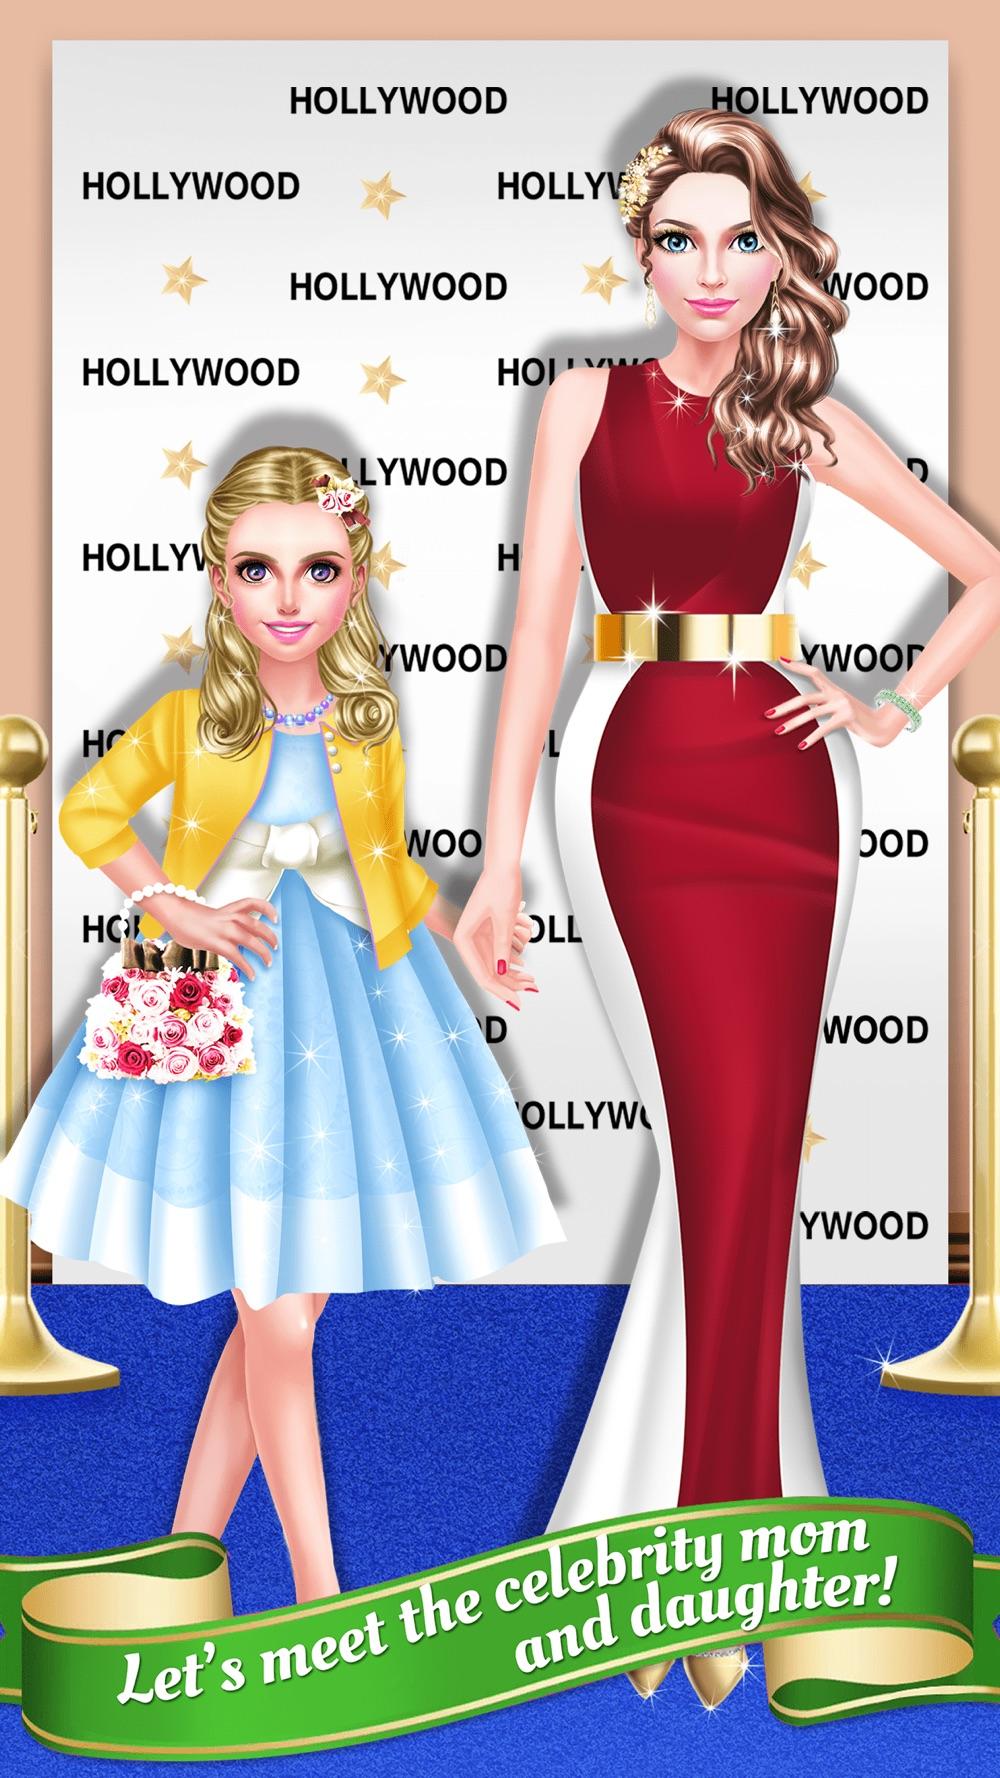 Hollywood Stars Salon – Mom & Daughter Family Spa